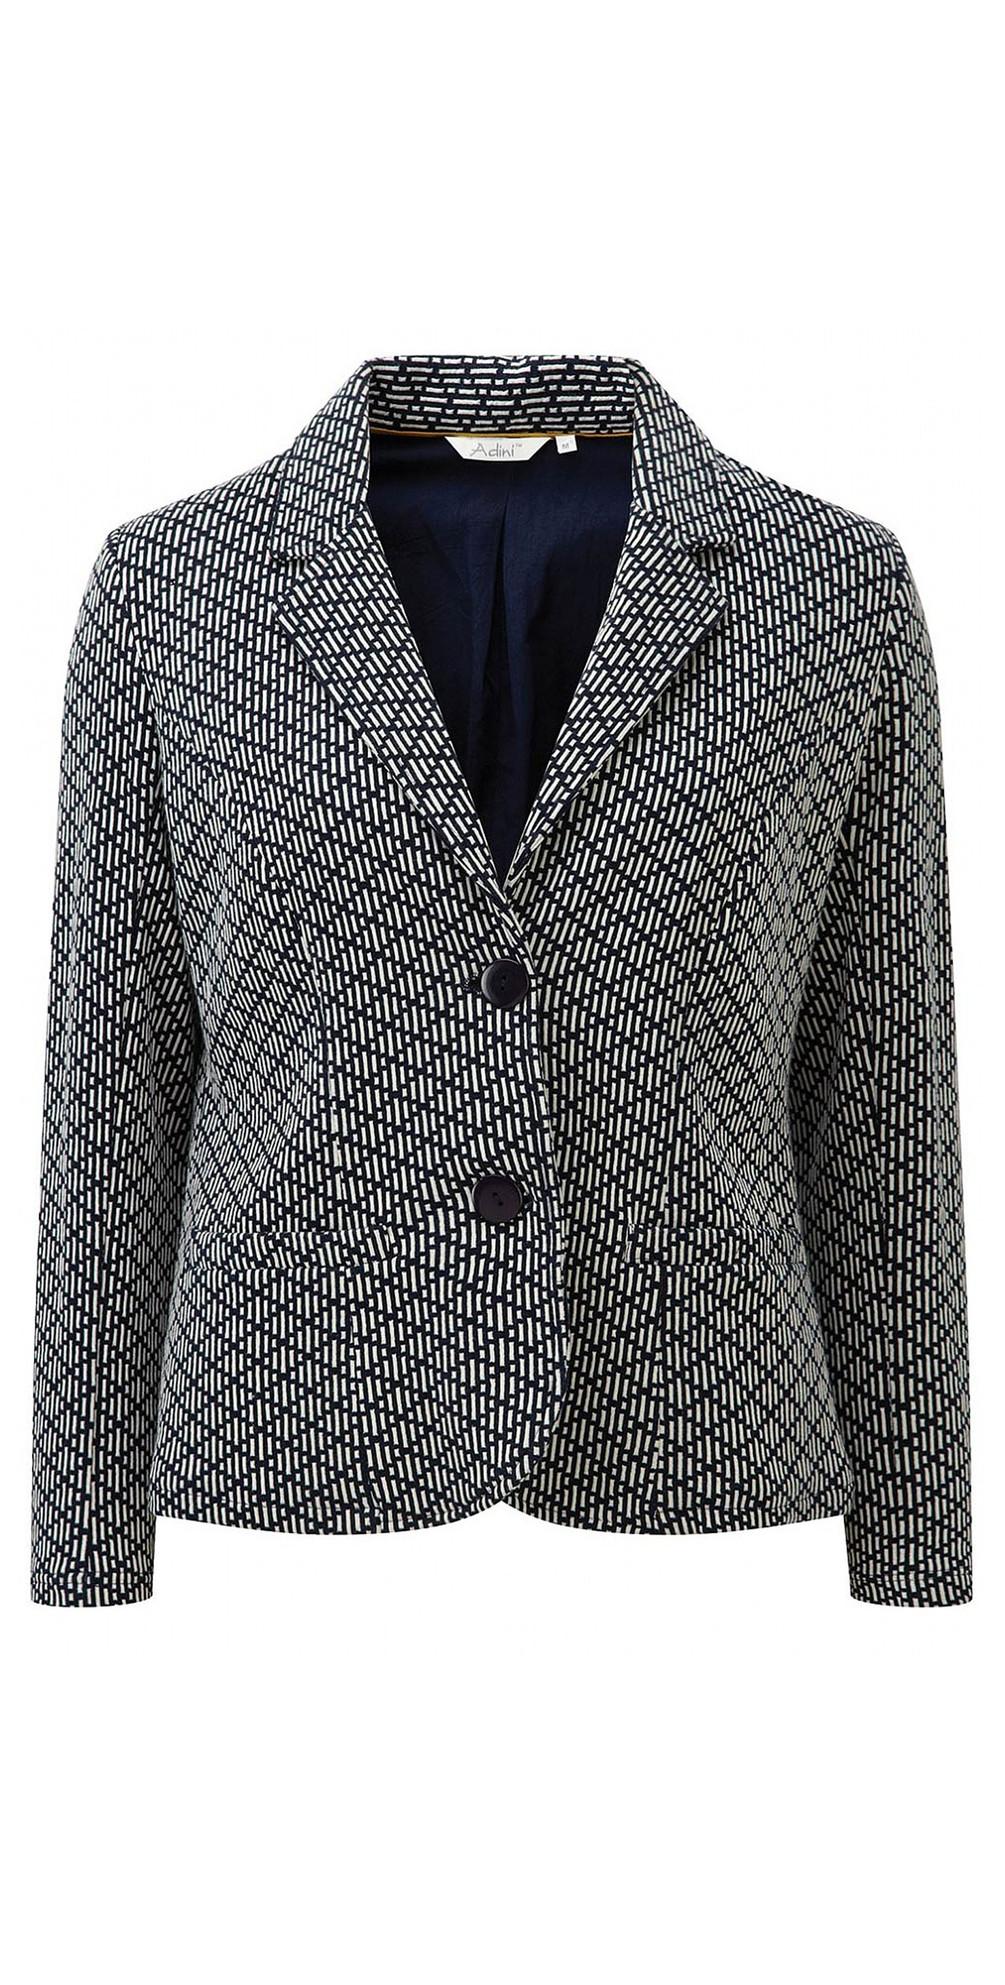 Brompton Weave Bury Jacket main image